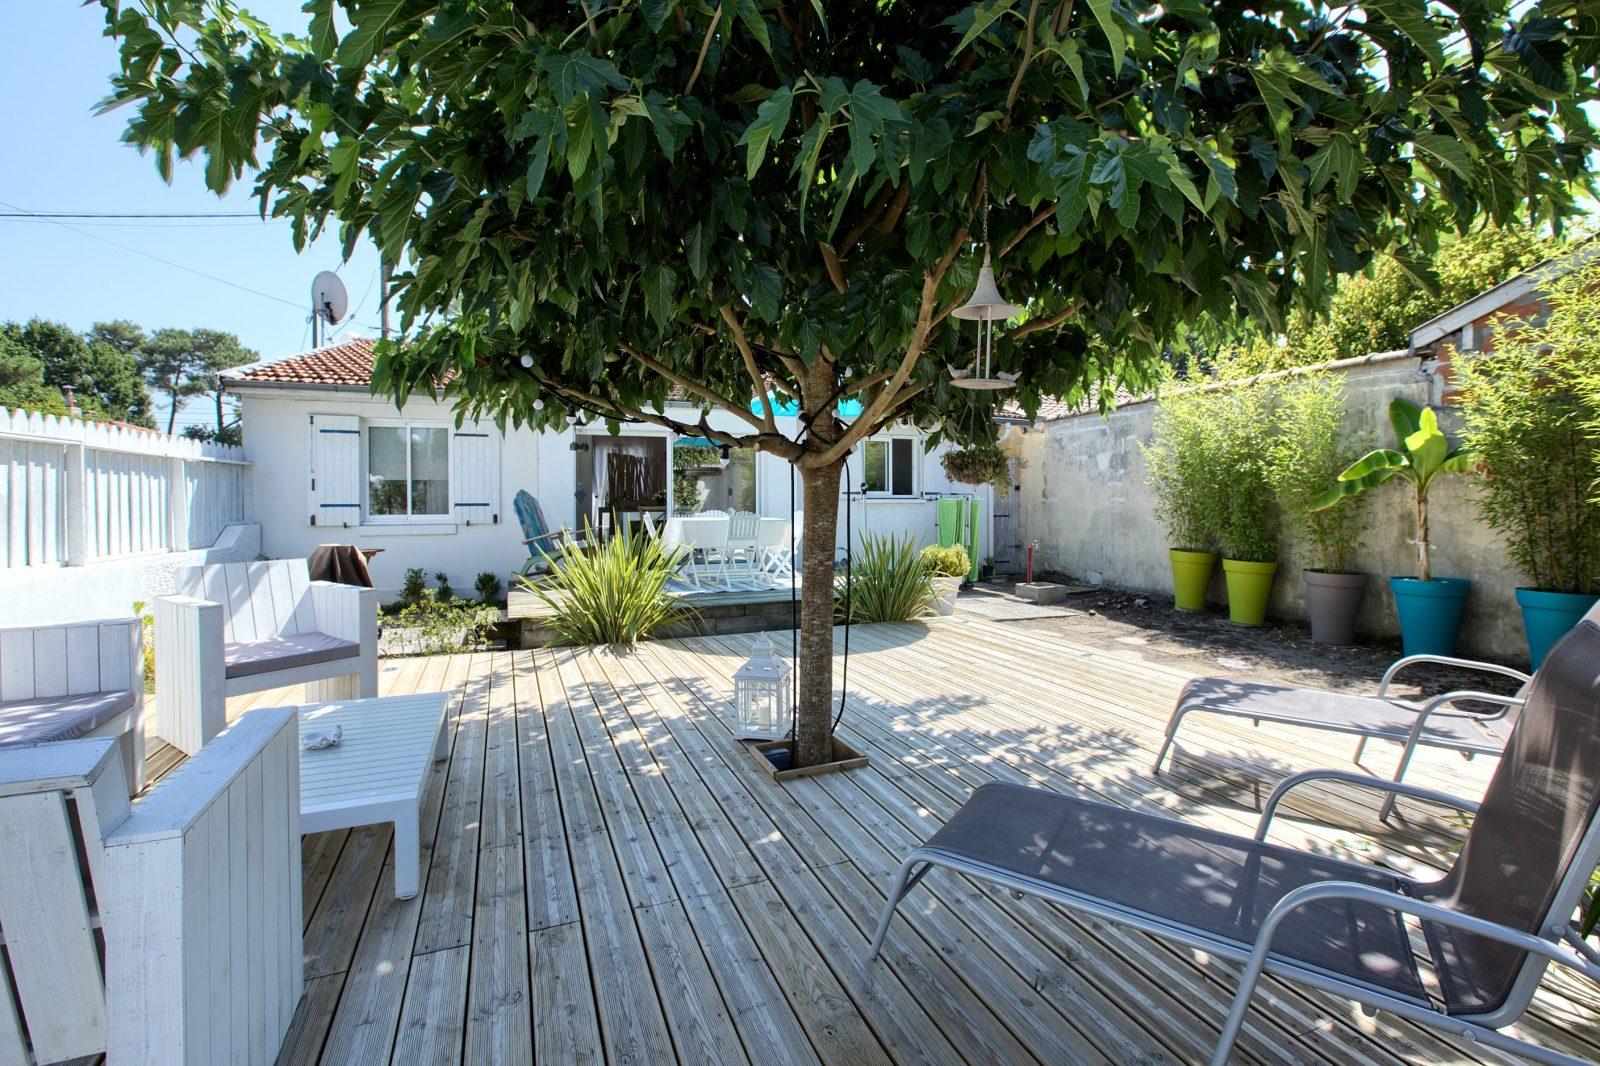 Andernos-Les-Bains – Mme SEGURA3 (2)